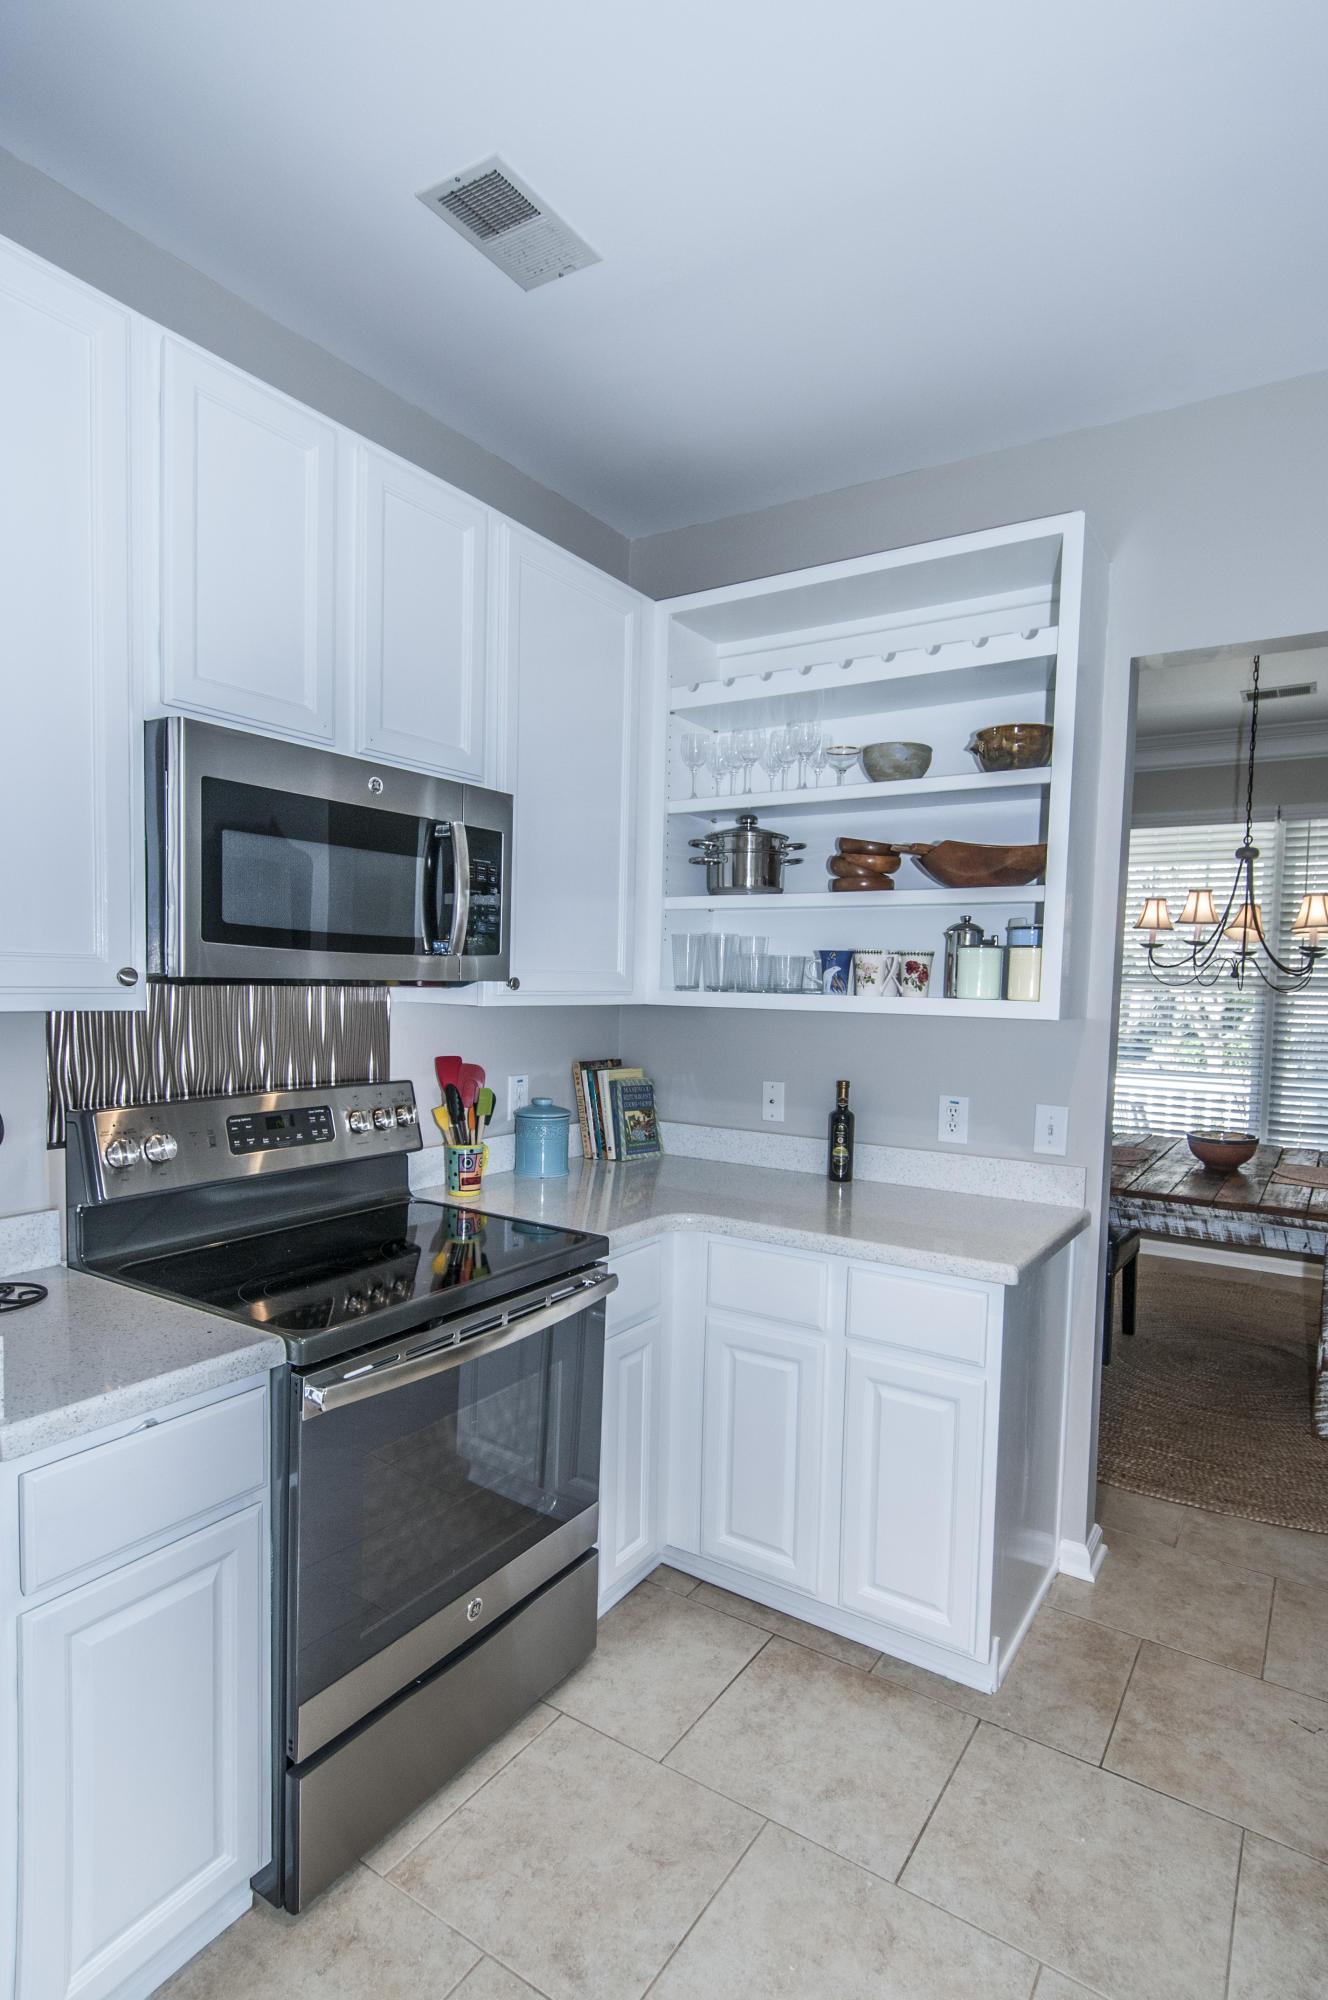 Etiwan Park Homes For Sale - 115 Brady, Daniel Island, SC - 38